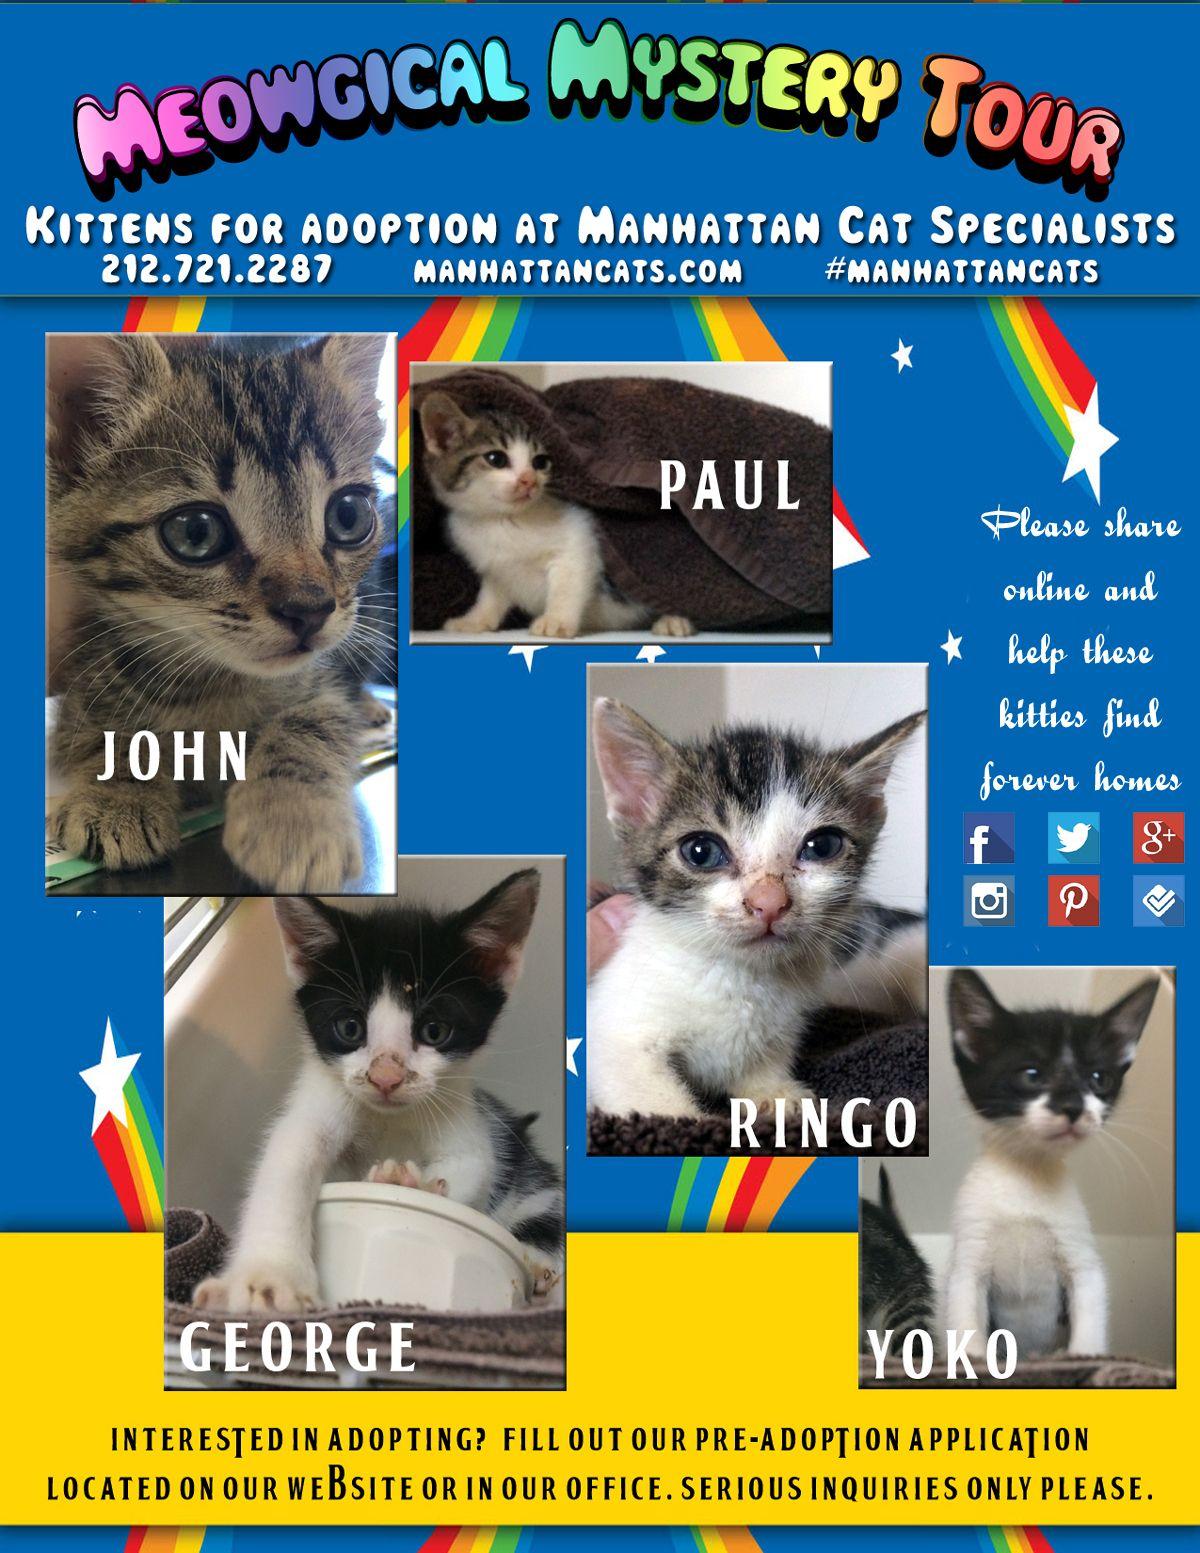 Adoption Corner With Images Kitten Adoption Cat Adoption Kittens